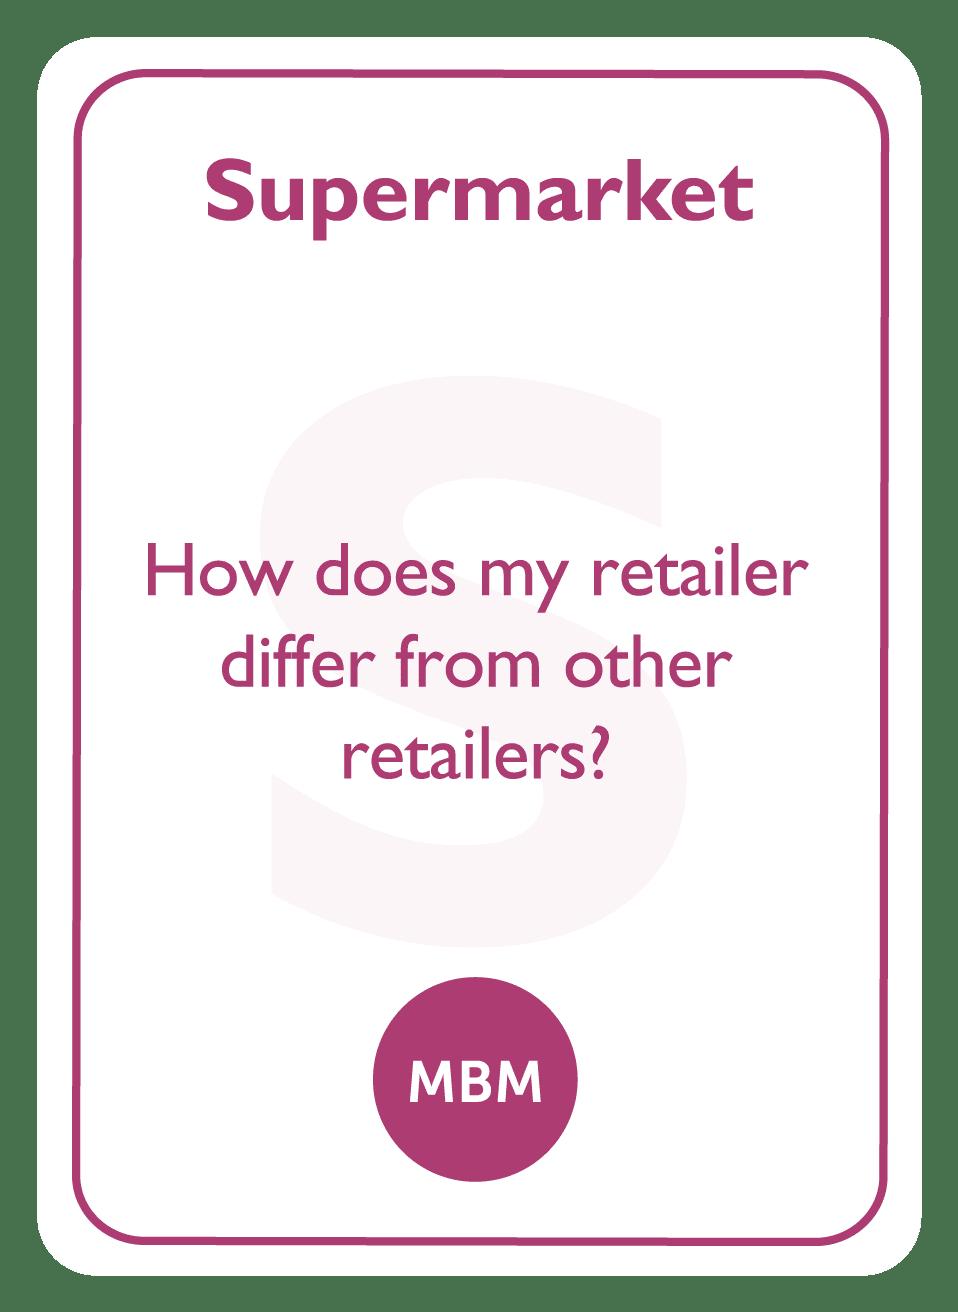 Negotiation coaching card titled Supermarket